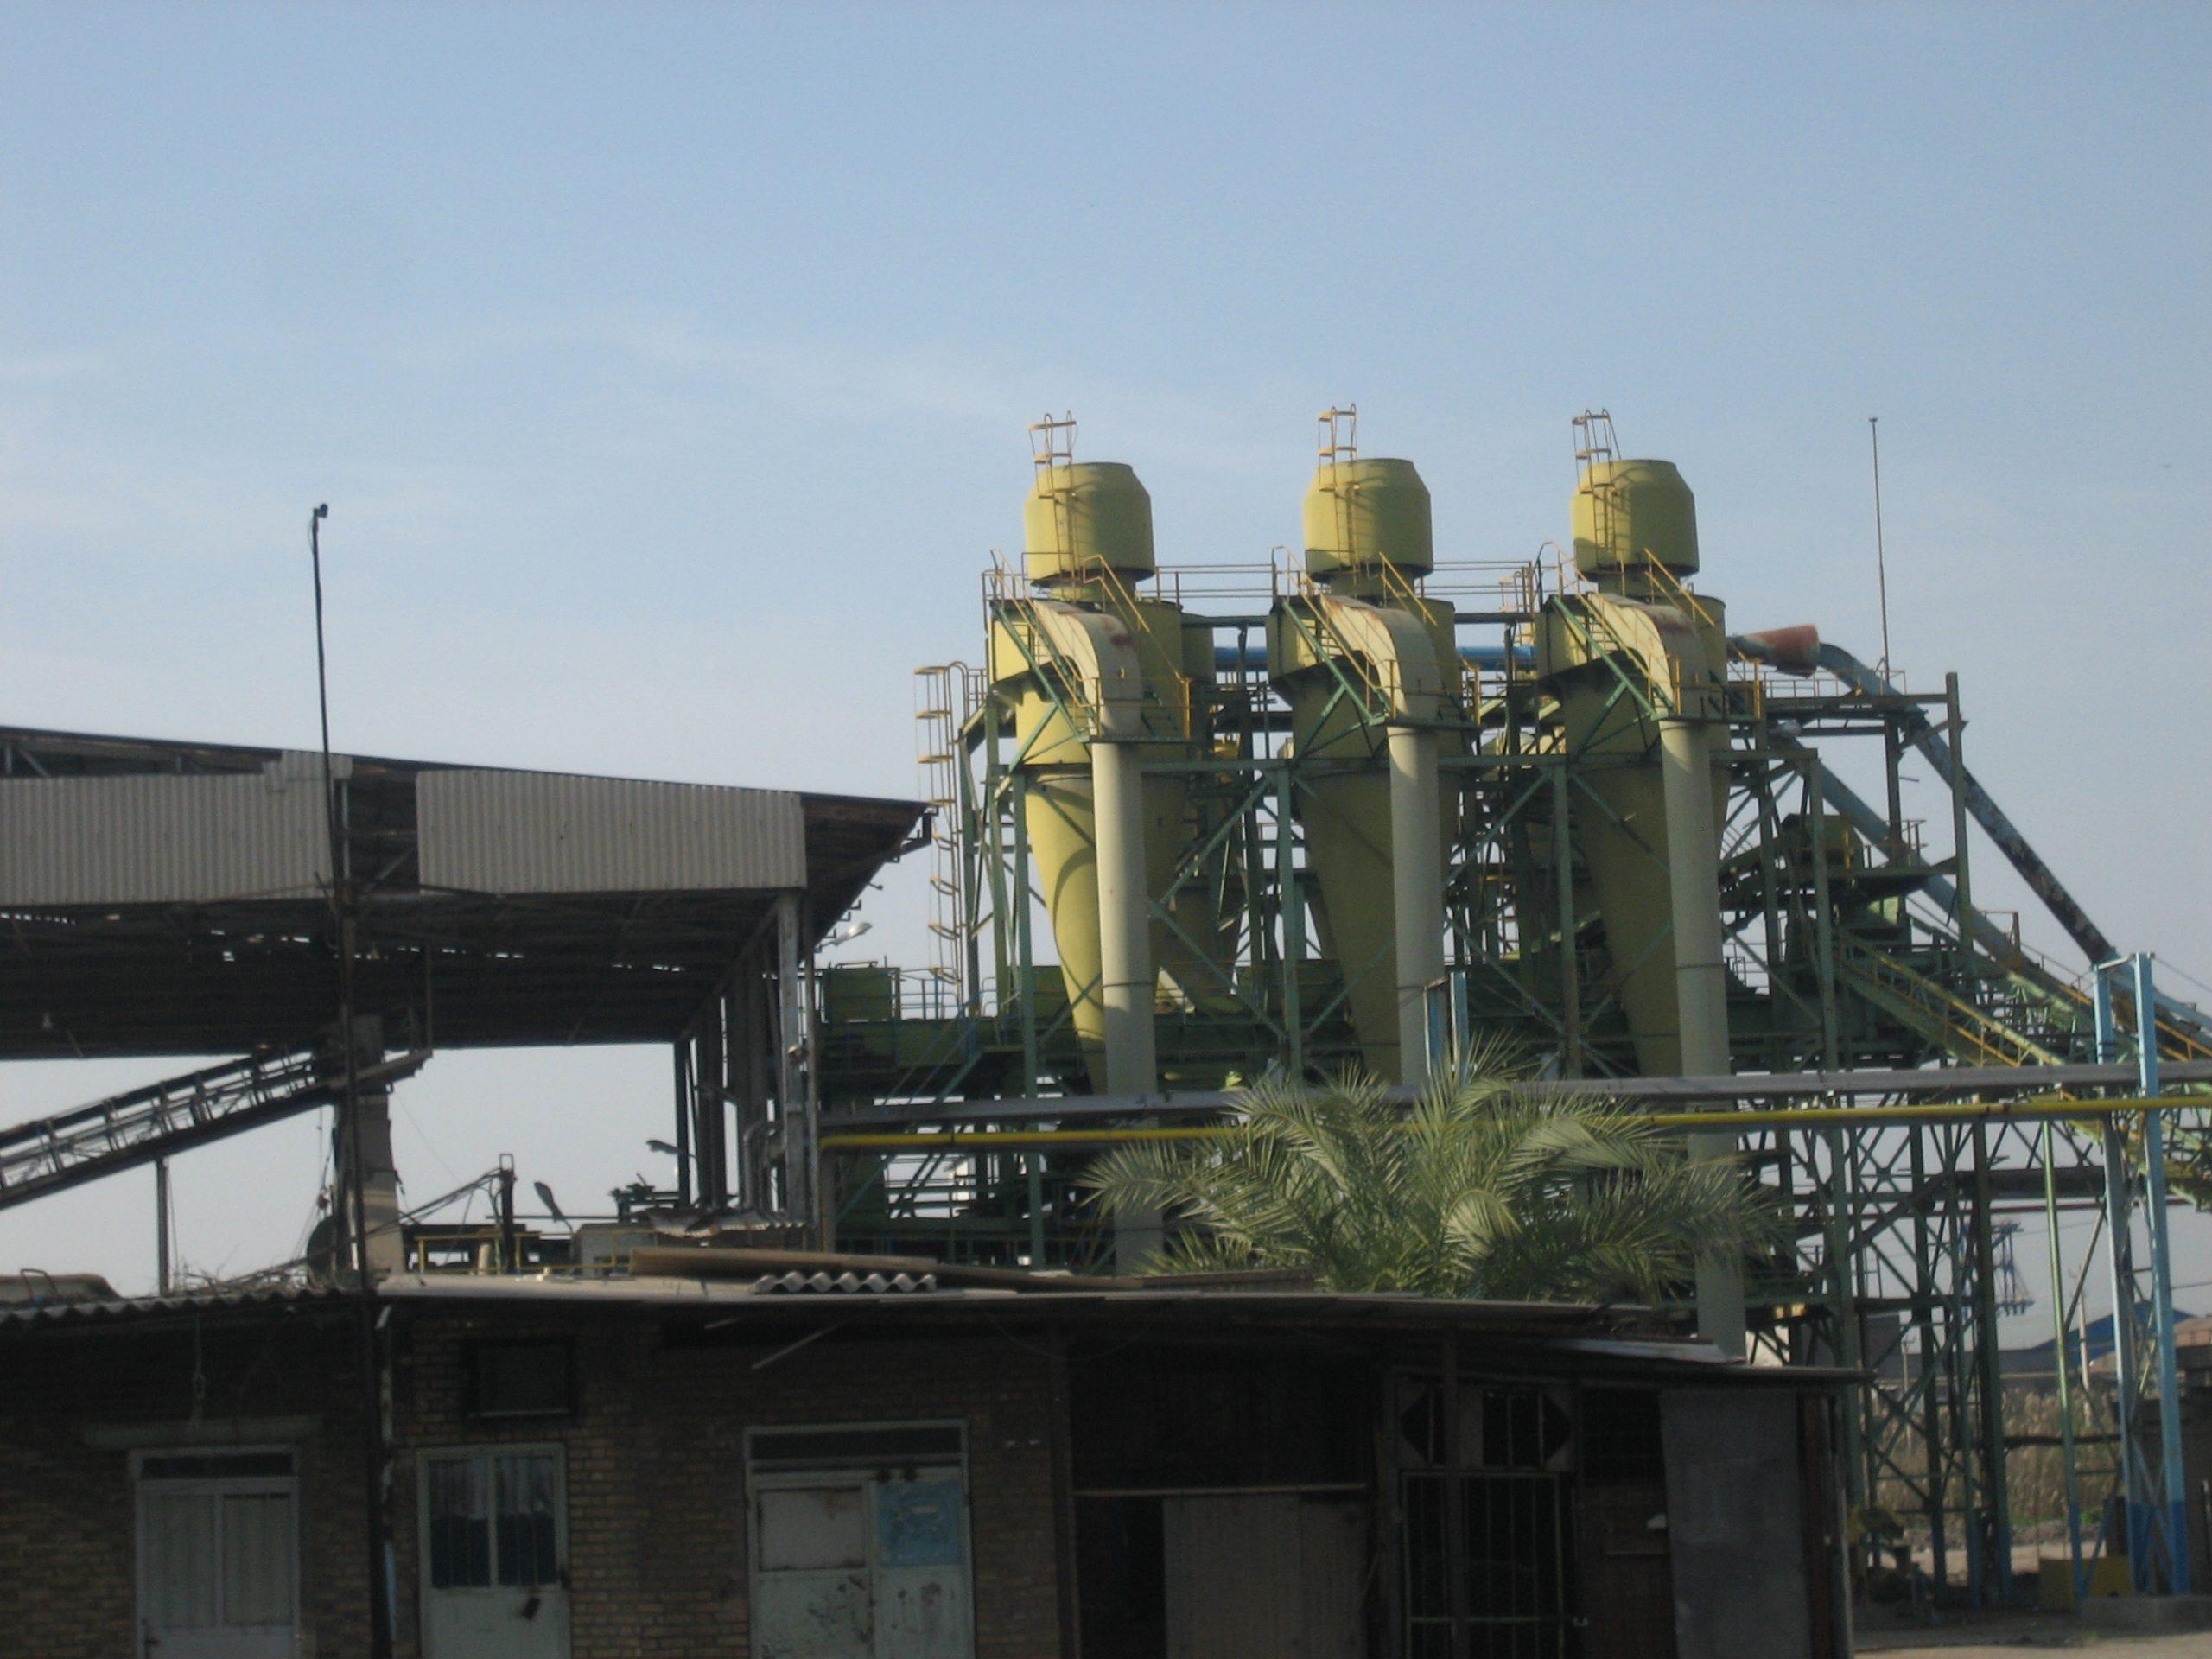 ممیزی و مدیریت مصرف انرژی درکارخانه کاغذ پارس